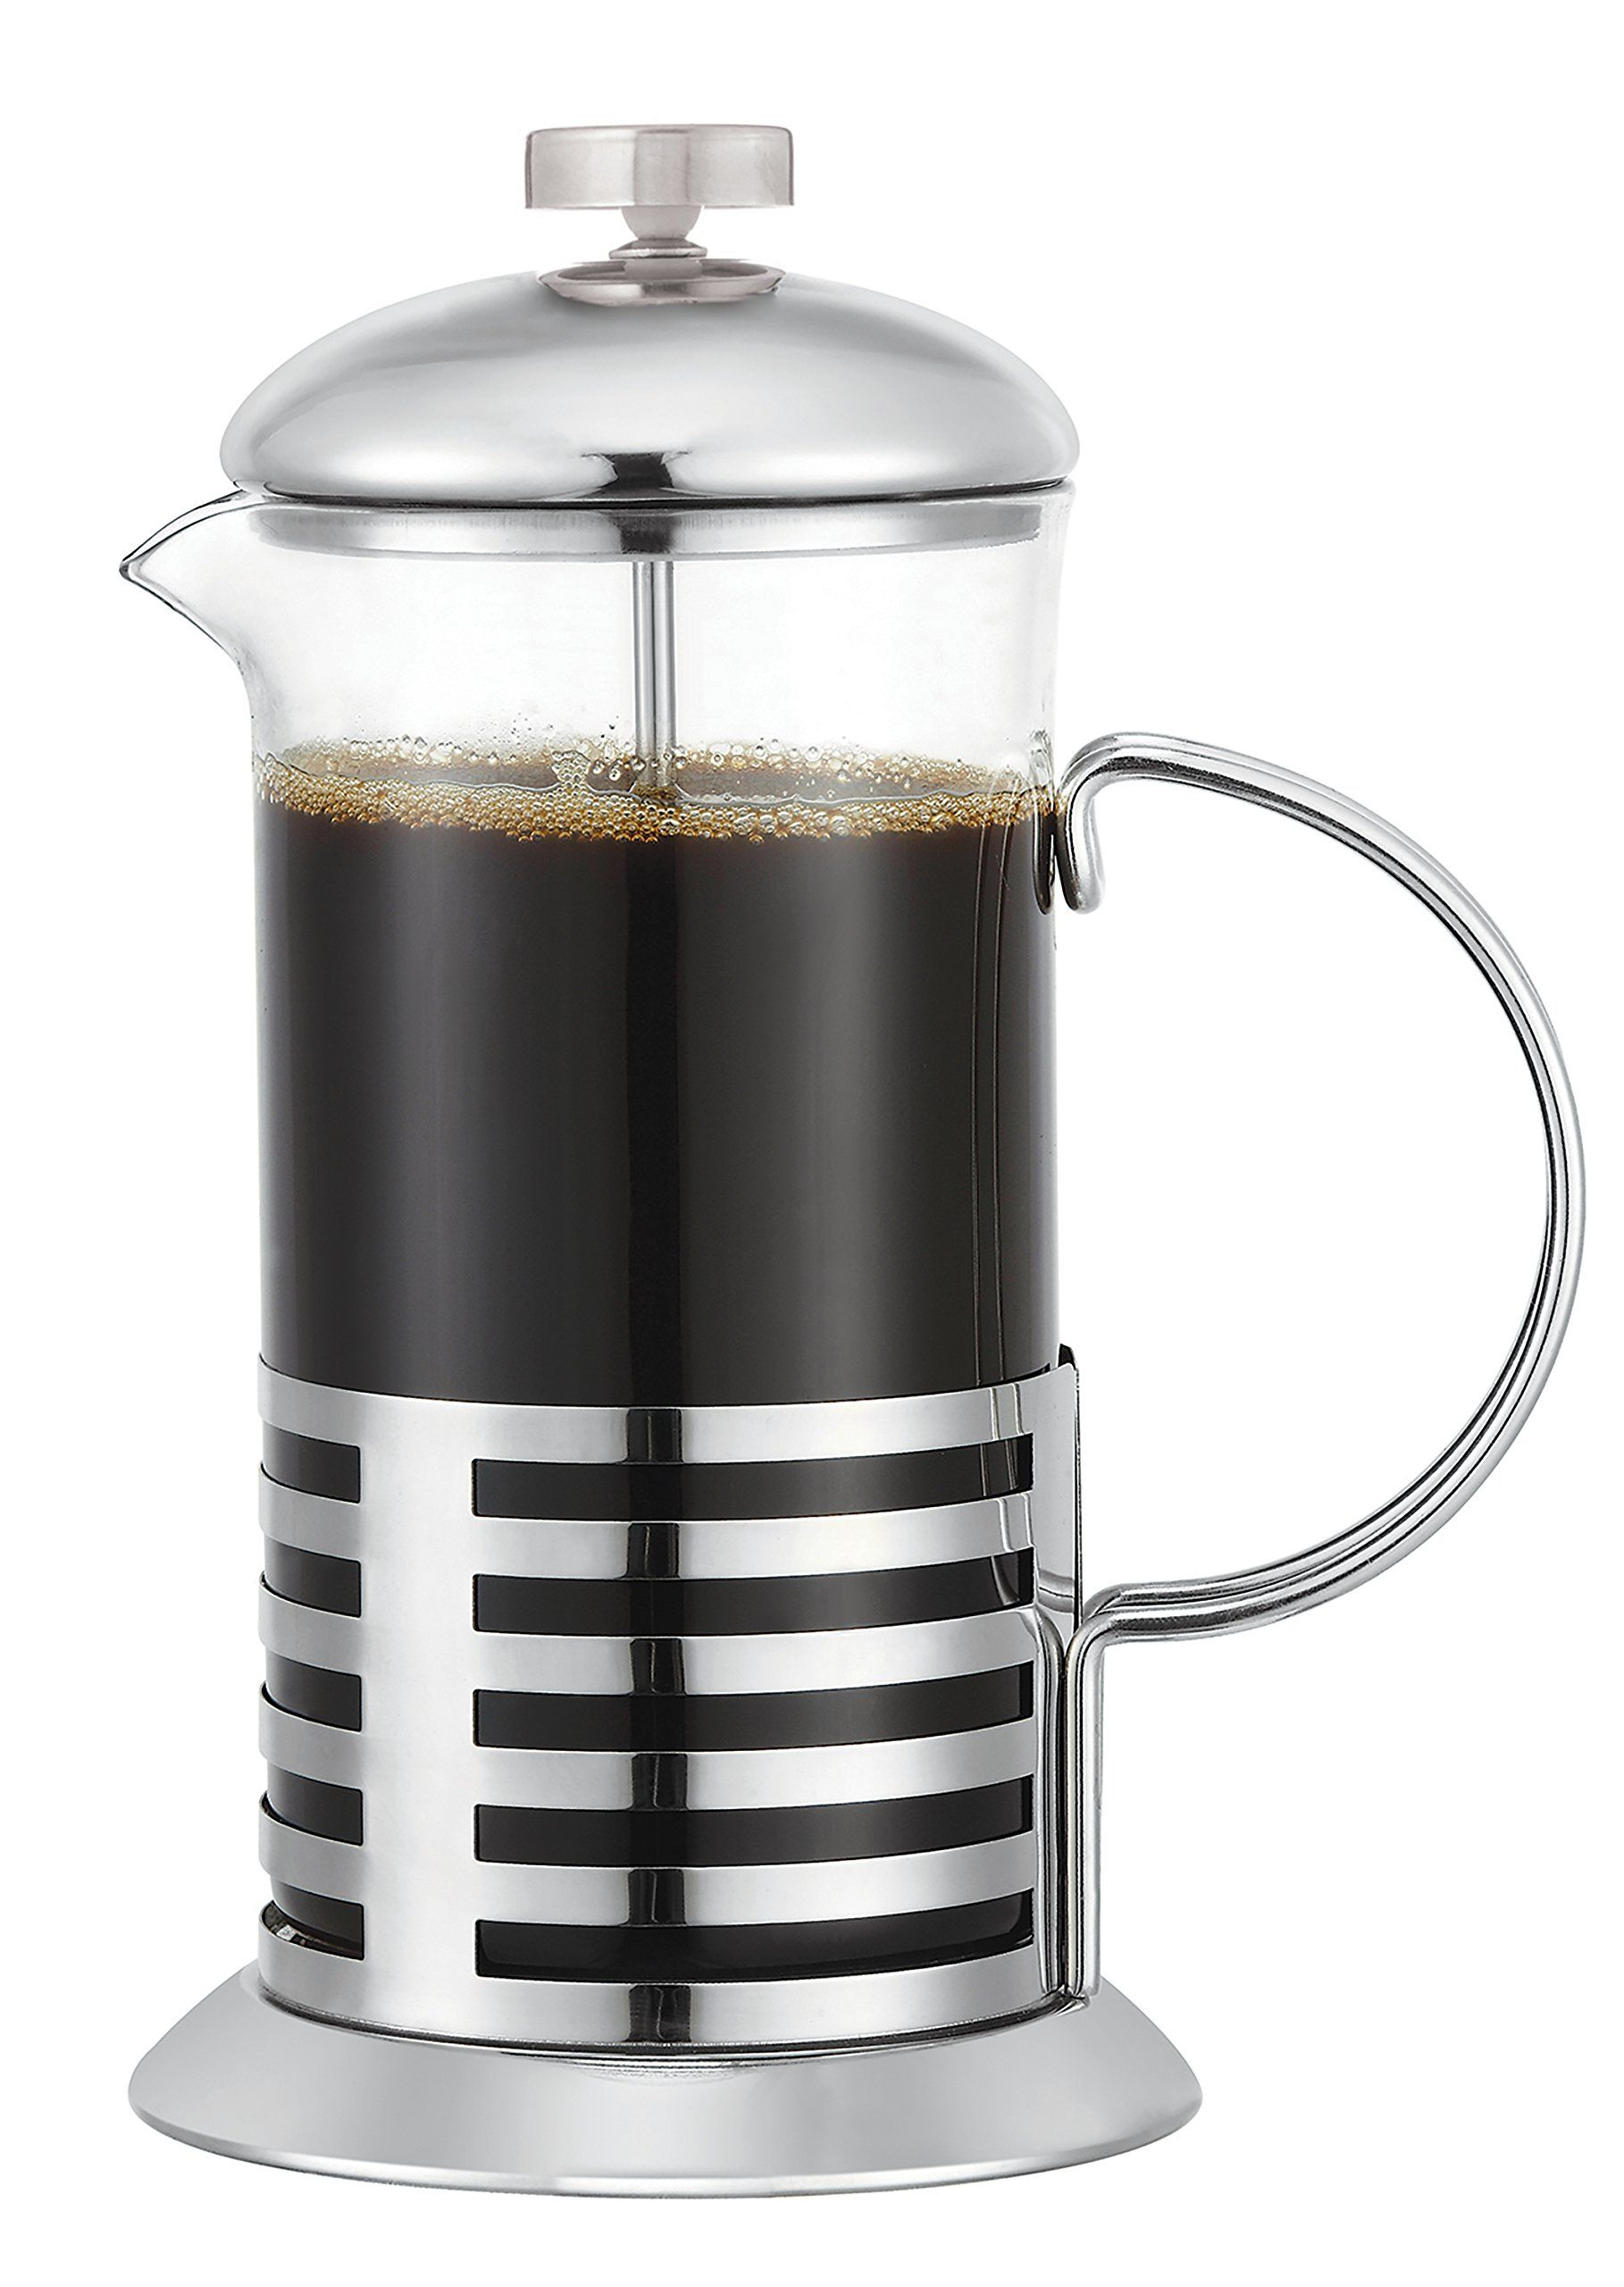 Bnf ktfrprs french press coffee maker 20 oz more info